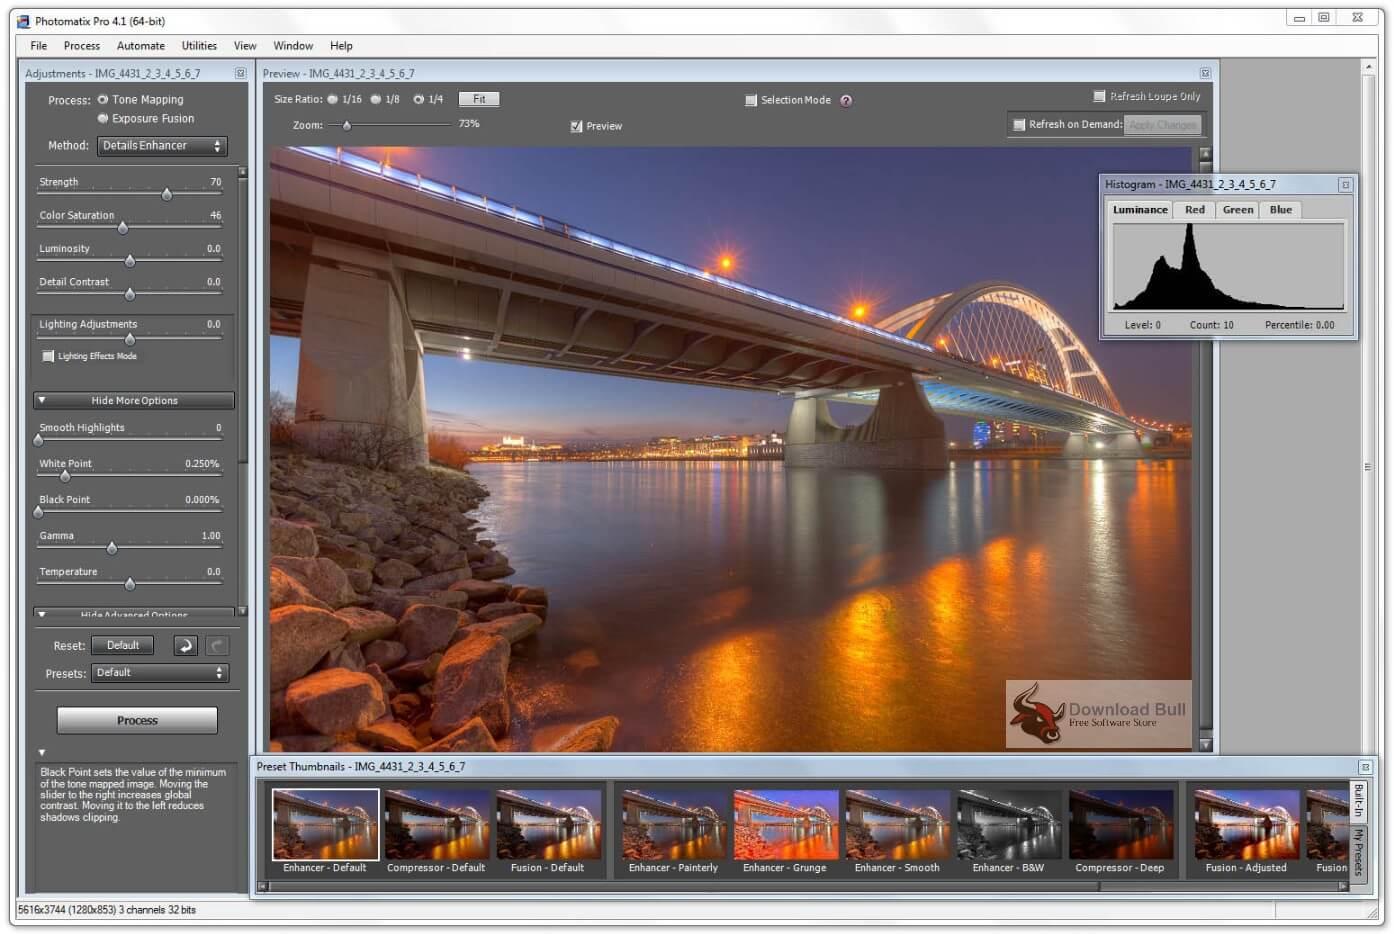 Photomatix Pro 6.2.1 Crack plus Serial Key Free 2021 [Latest] Download